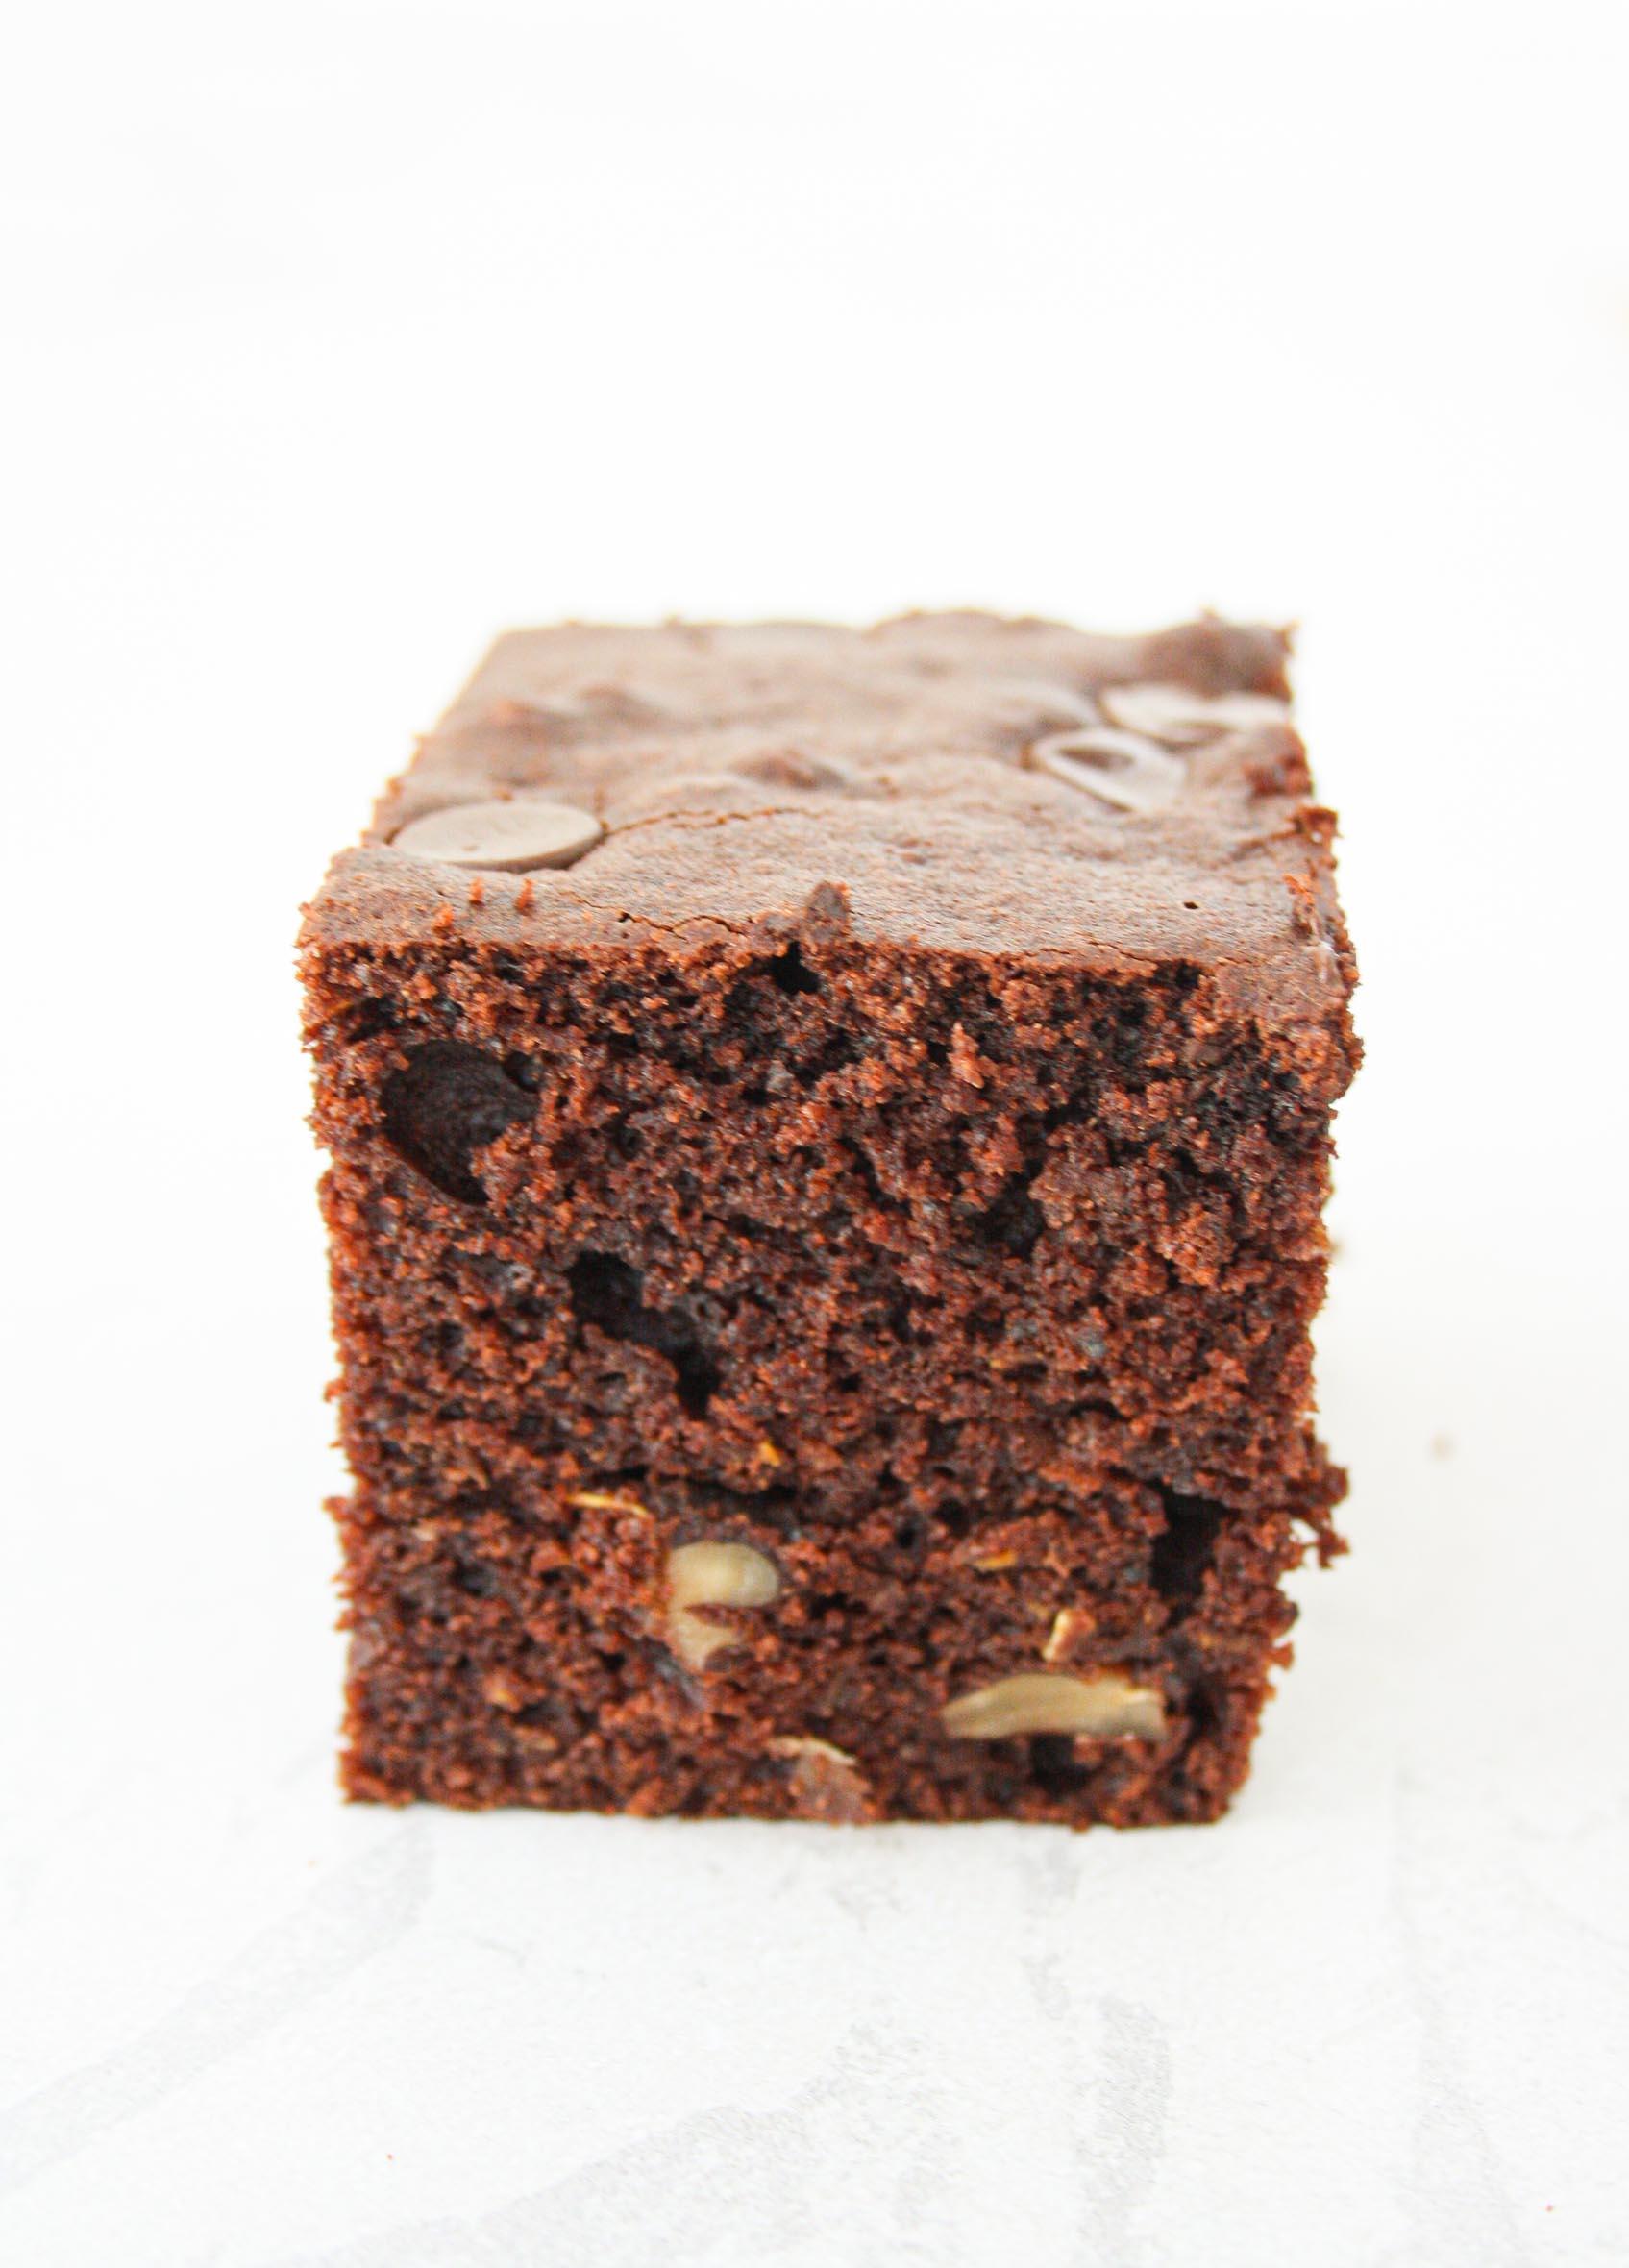 close up of a square slice of chocolate zucchini cake